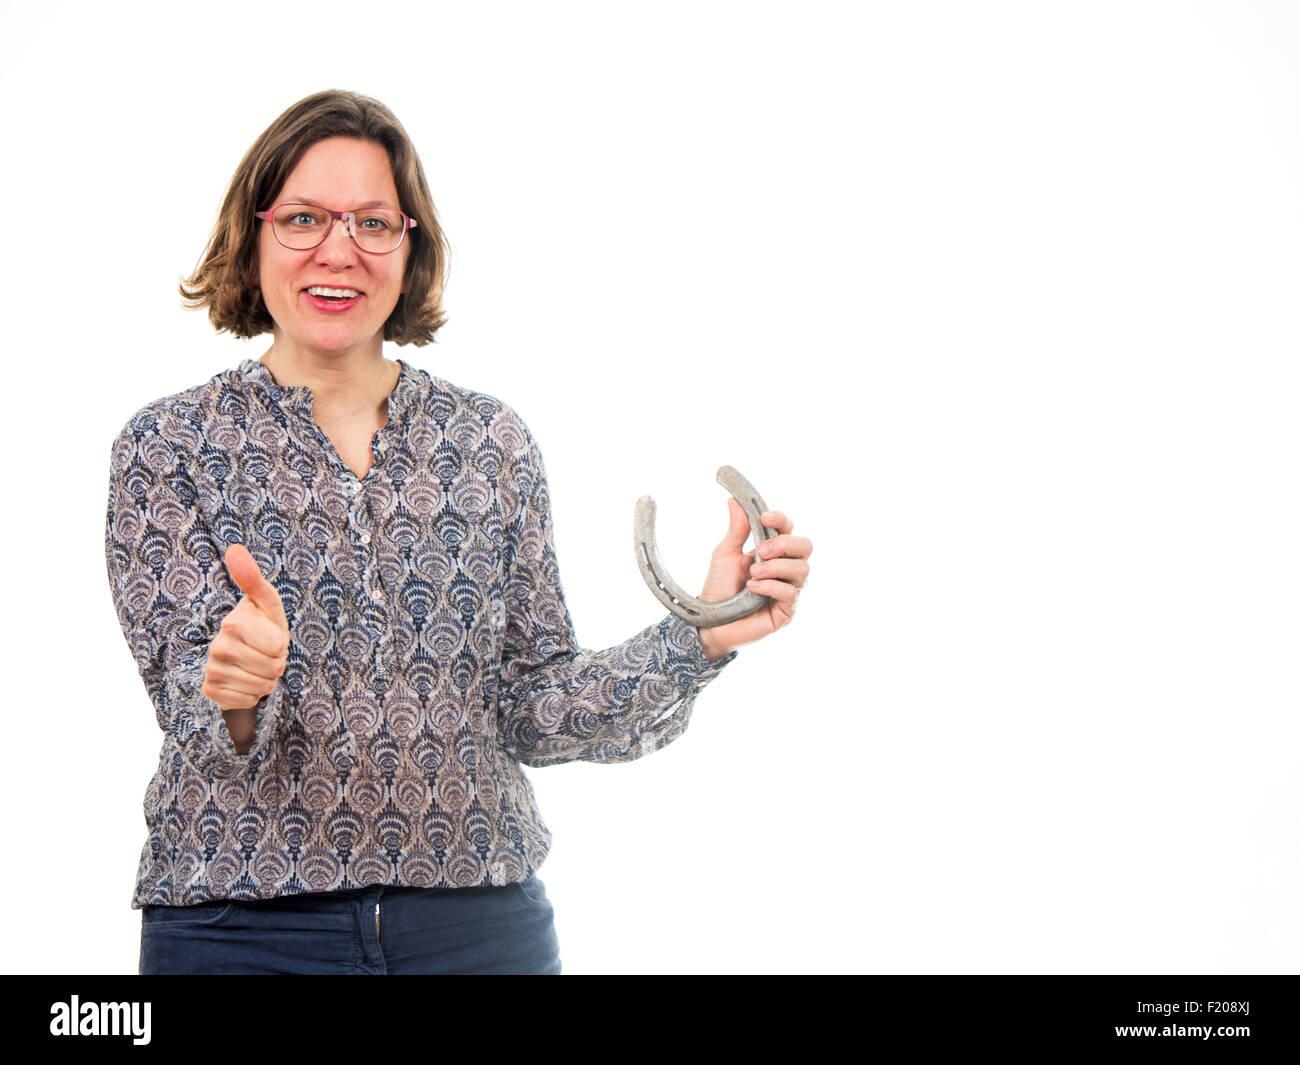 Frau wünscht Glück - Stock Image